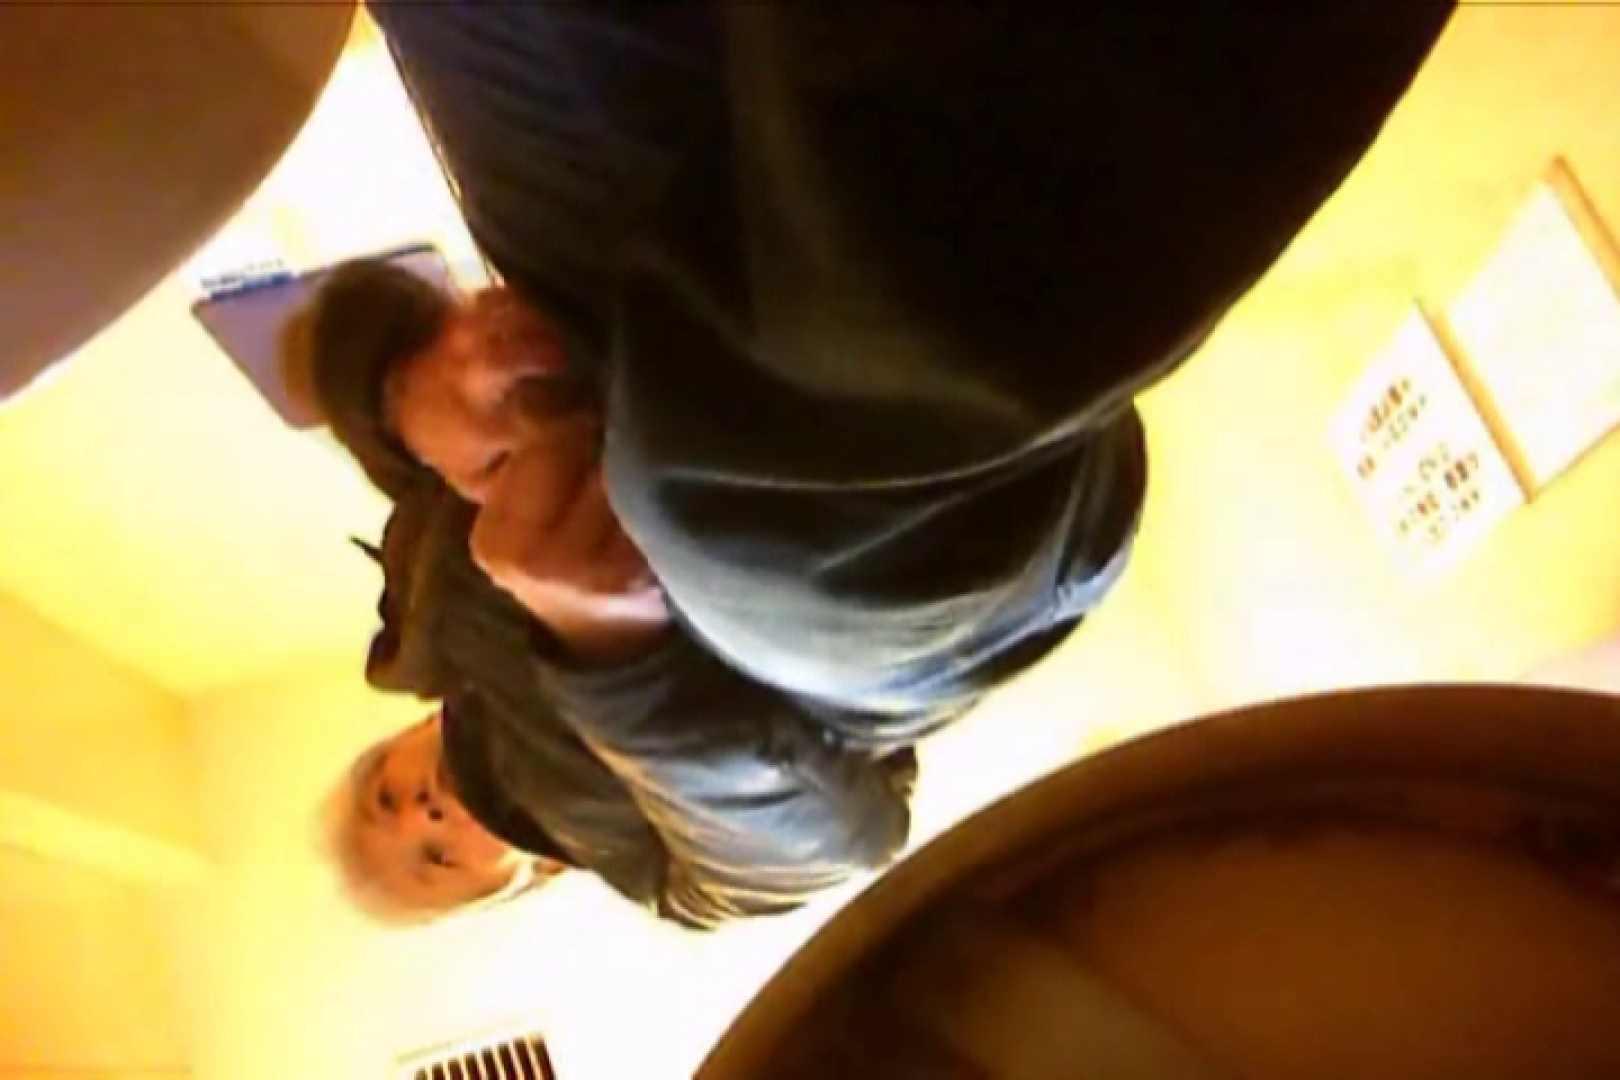 SEASON 2ND!掴み取りさんの洗面所覗き!in新幹線!VOL.13 リーマン系ボーイズ | 人気シリーズ  80pic 13